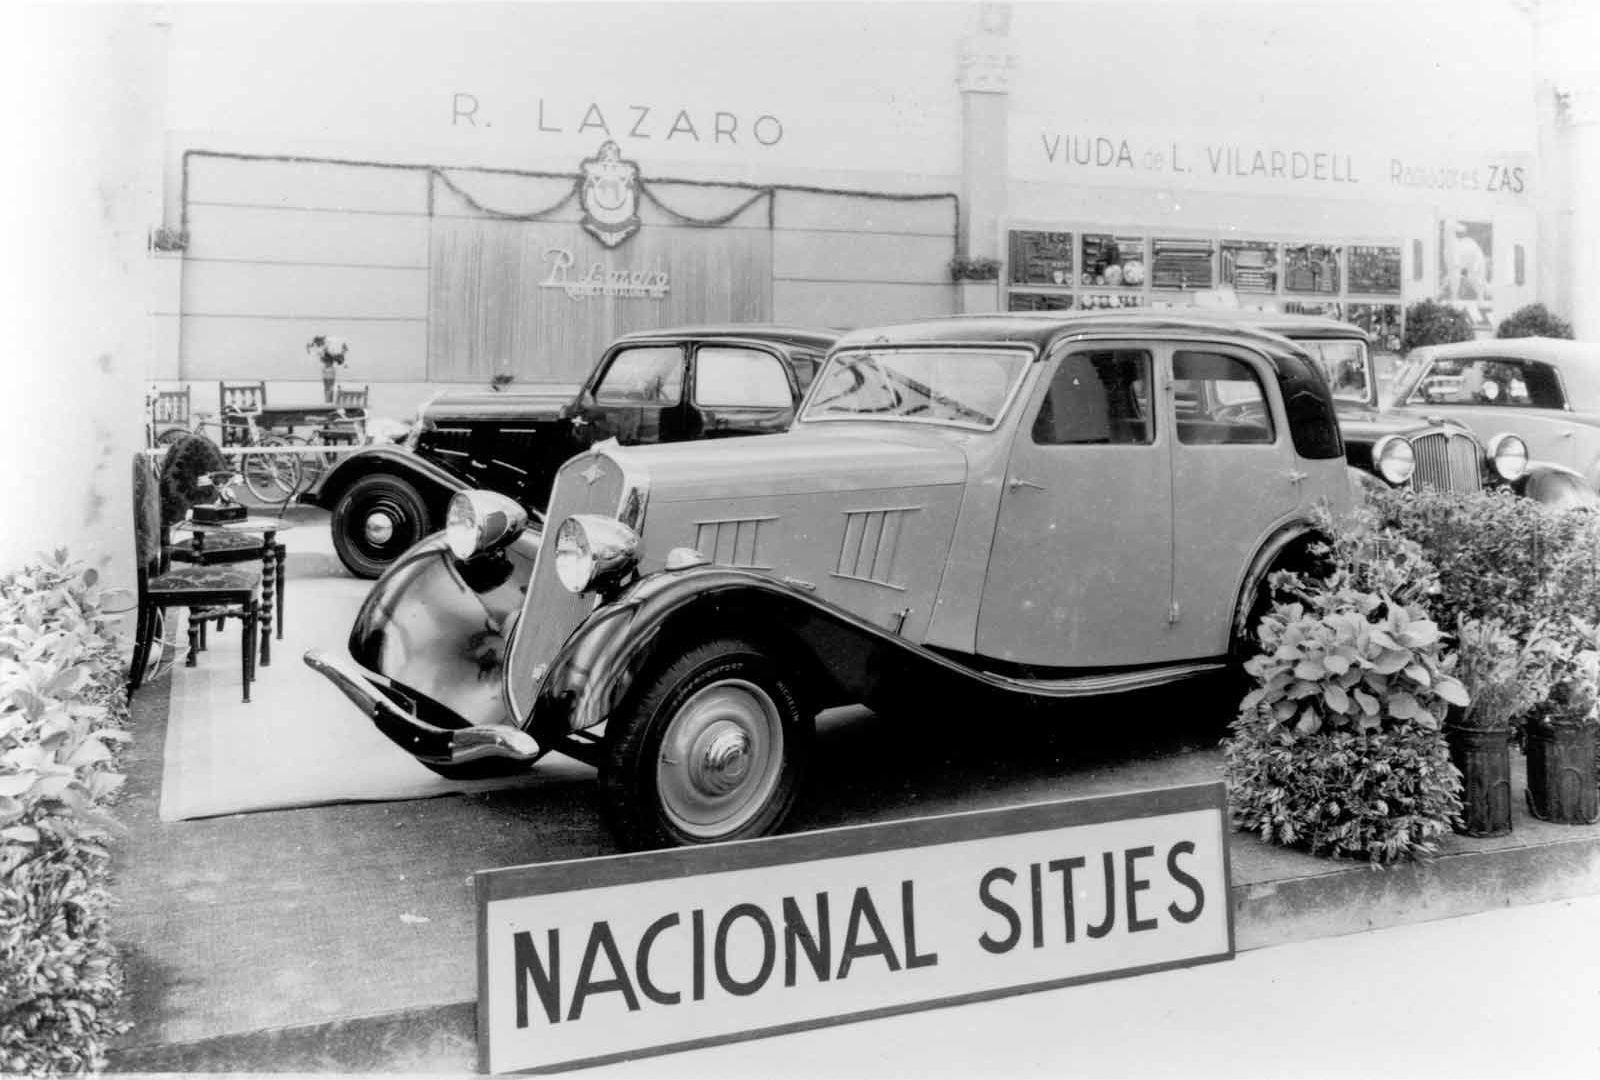 11 1935 Salon Automovil Barcelona Estand Nacional Sitjes